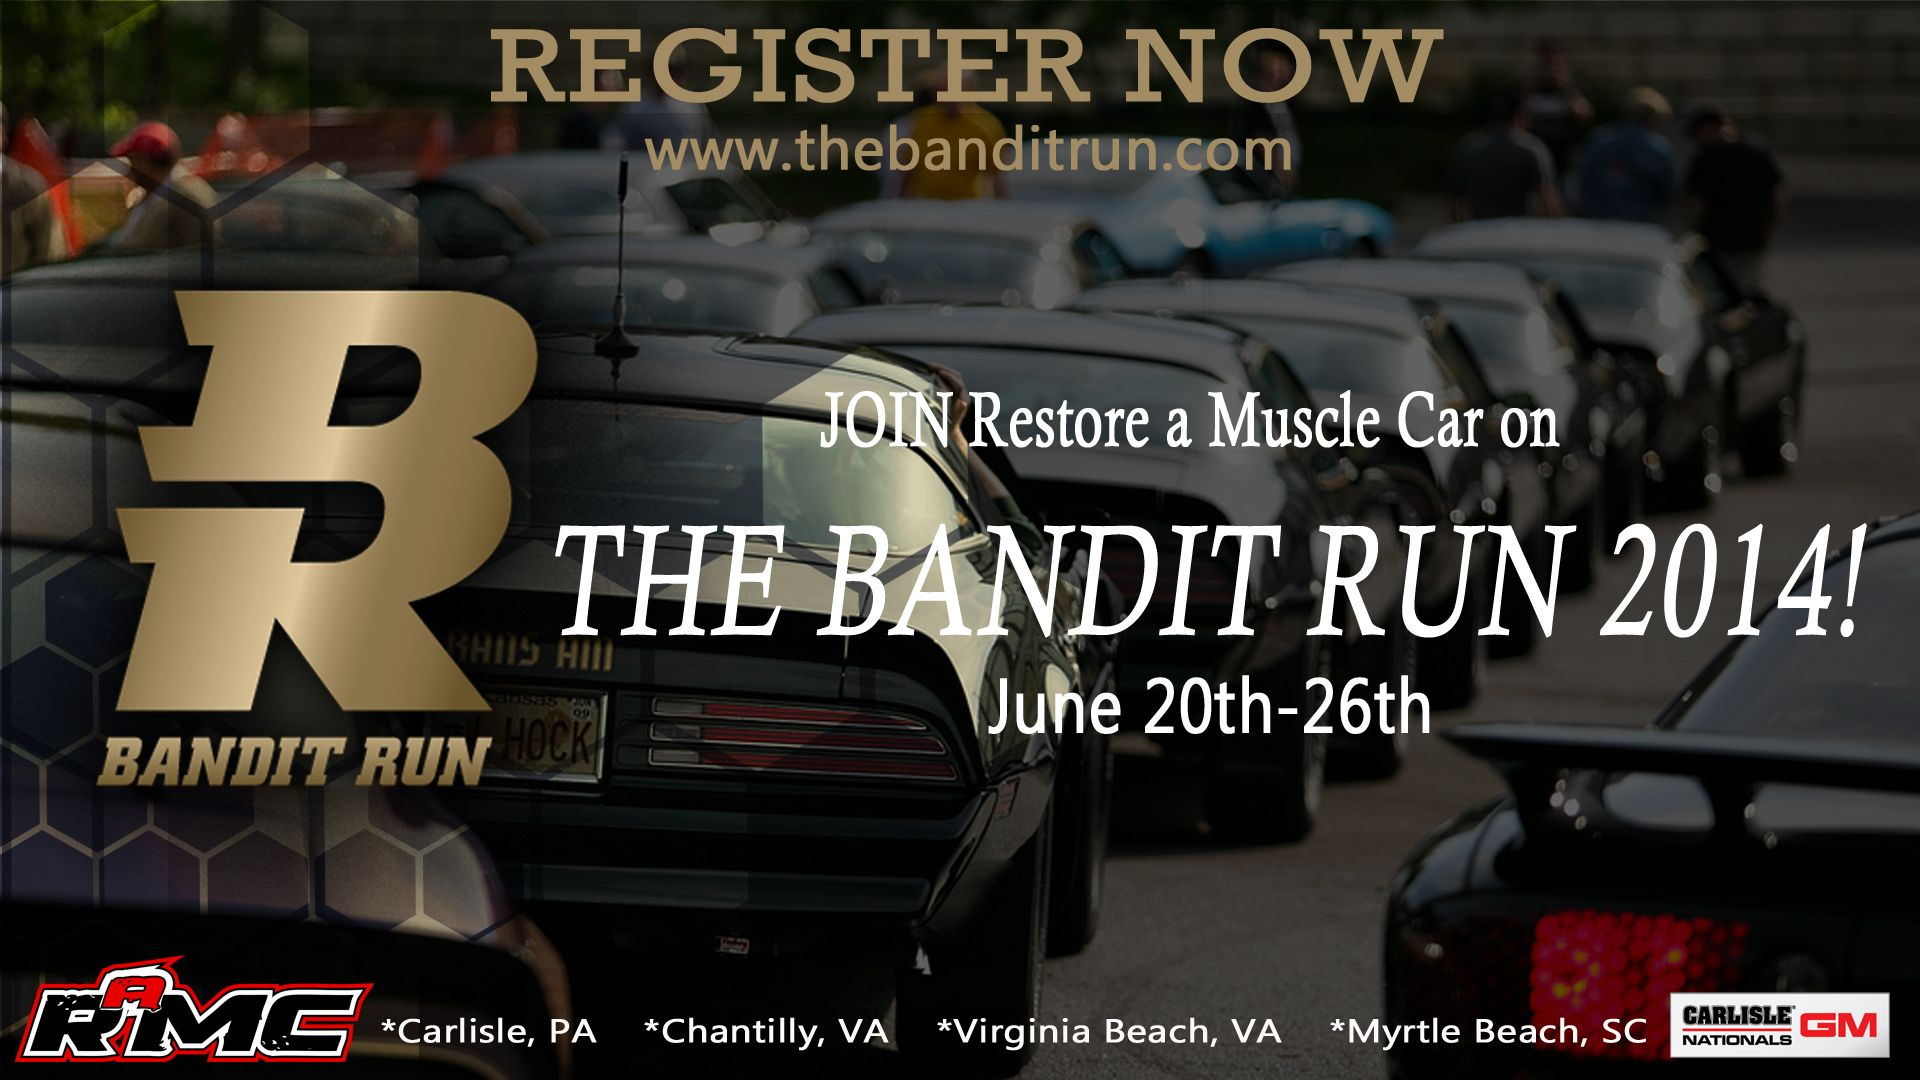 REGISTER NOW! The Bandit Run 2014!